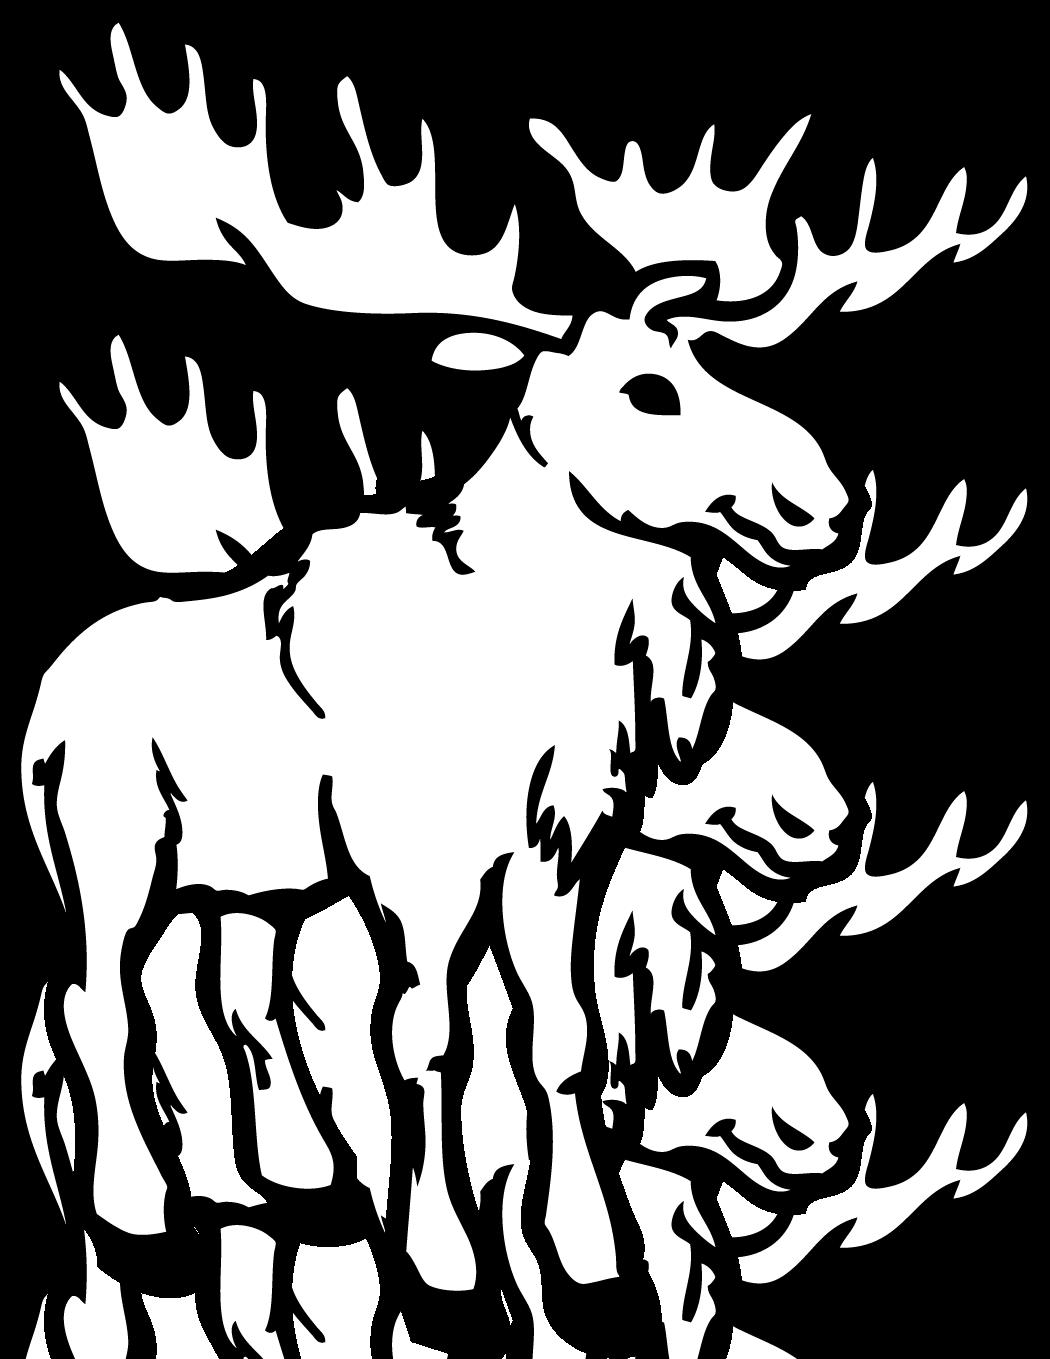 Moose clipart wildlife alaska. Deer coloring book adult